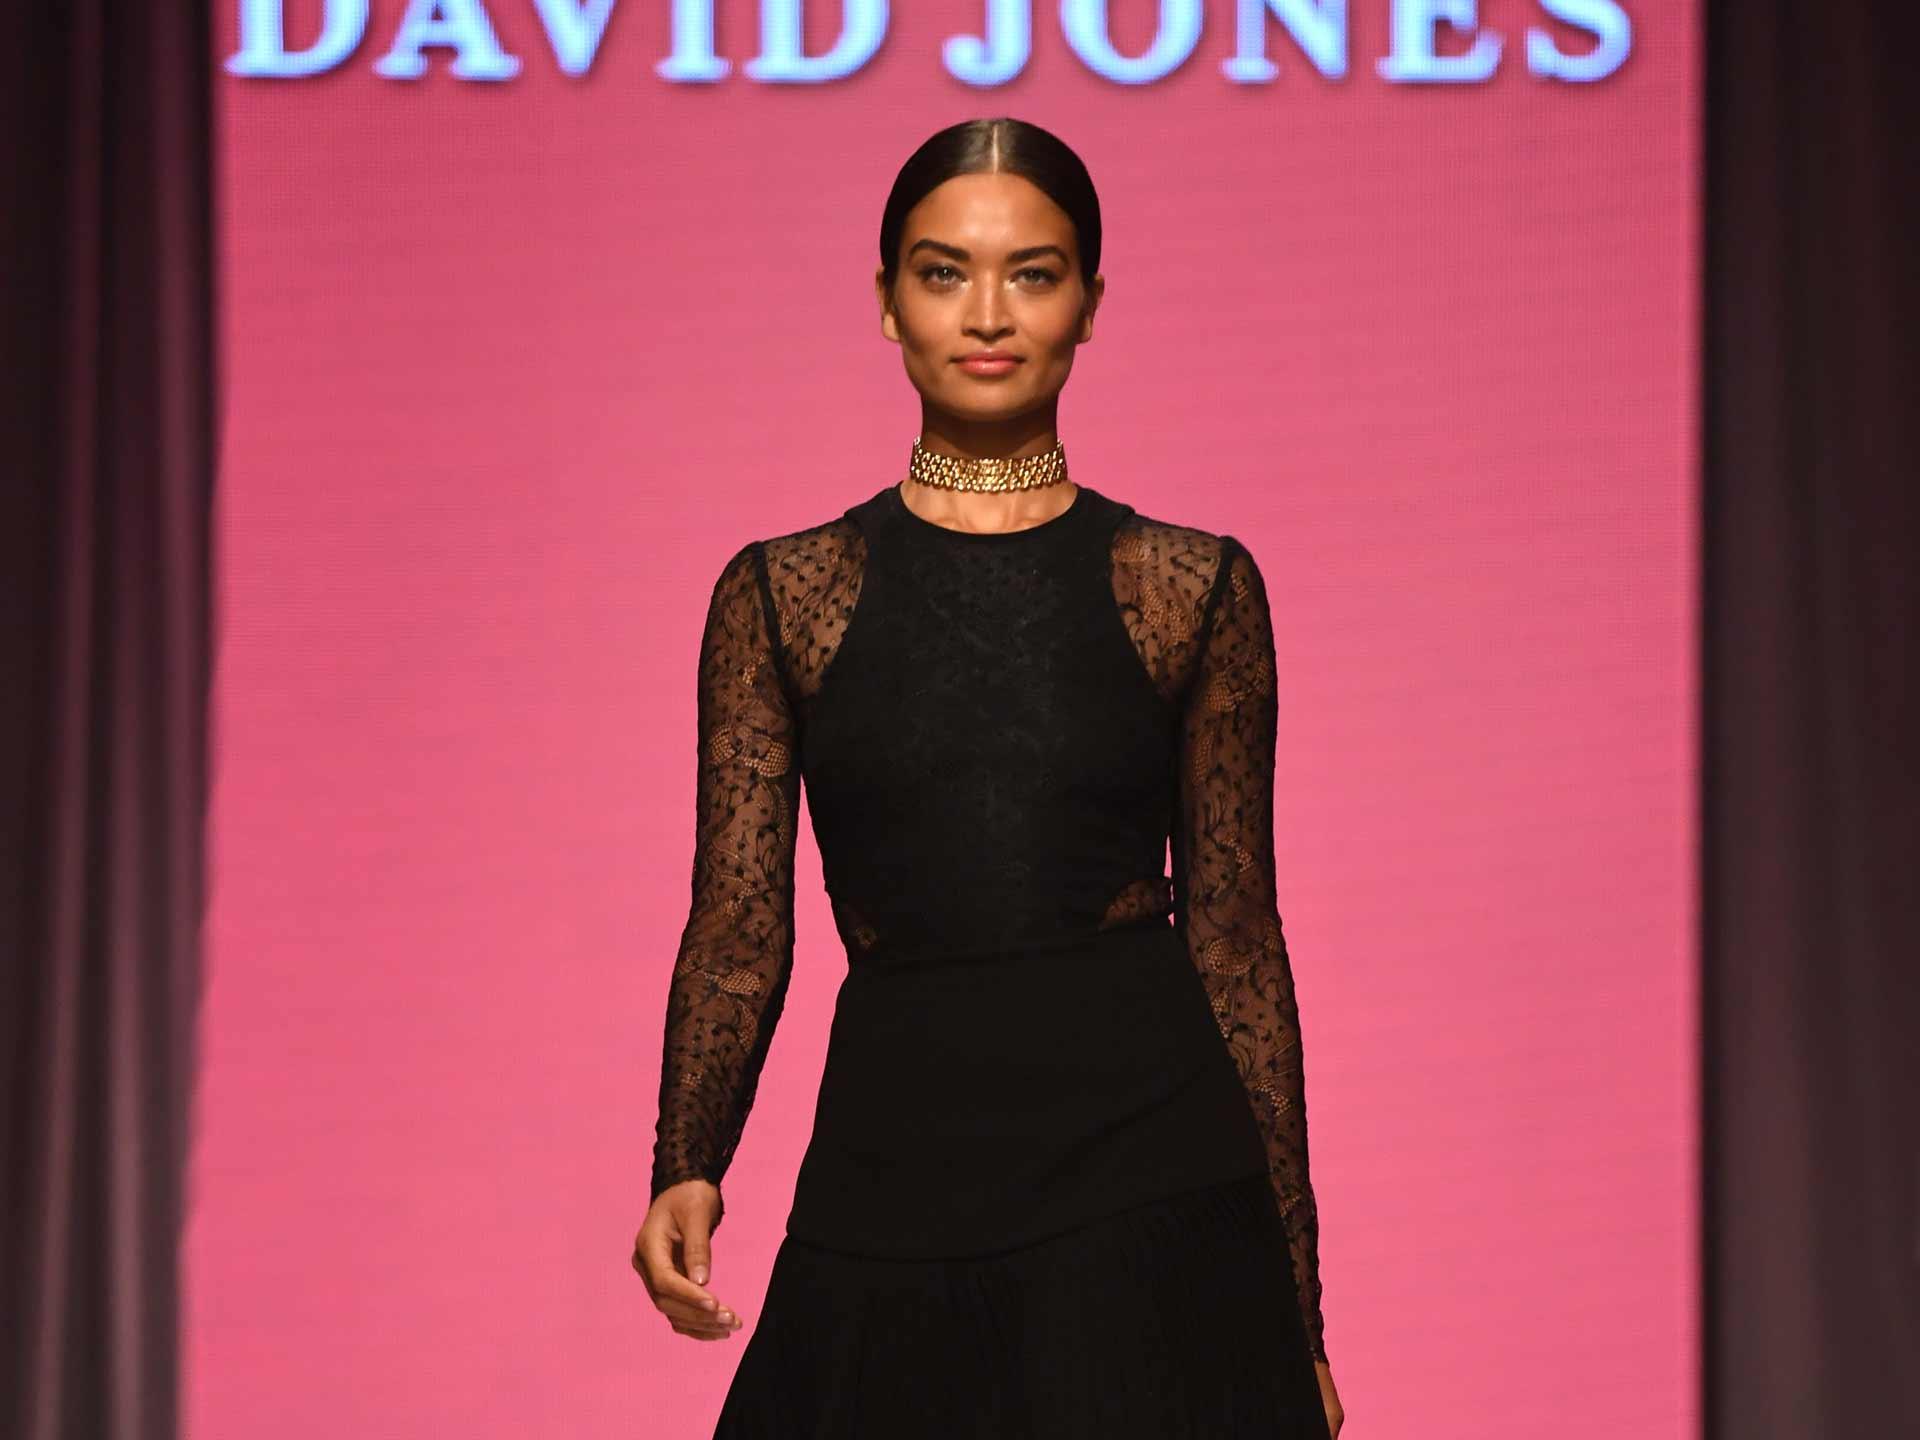 Model Shanina Shaik wears an outfit by Self Portrait. (AFP)